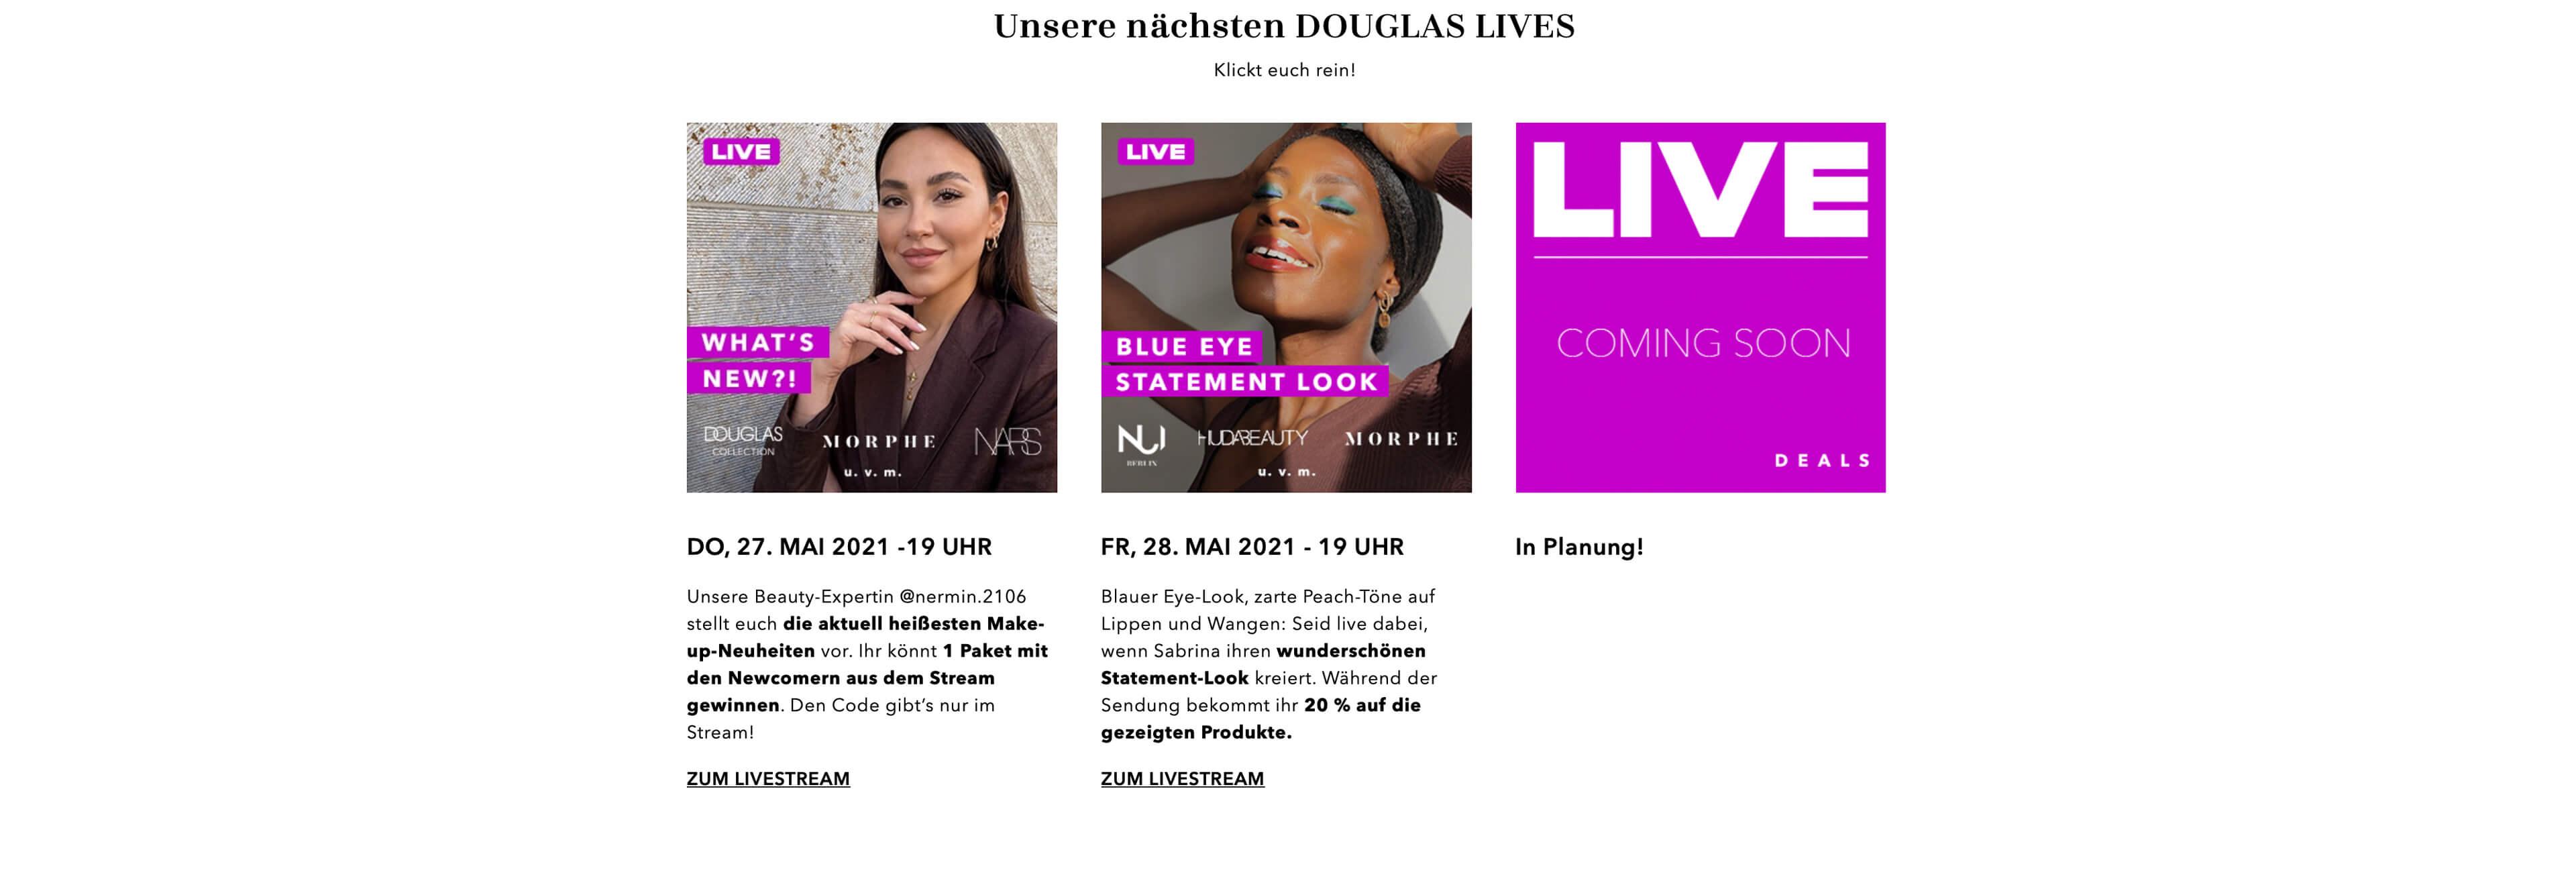 Douglas Live